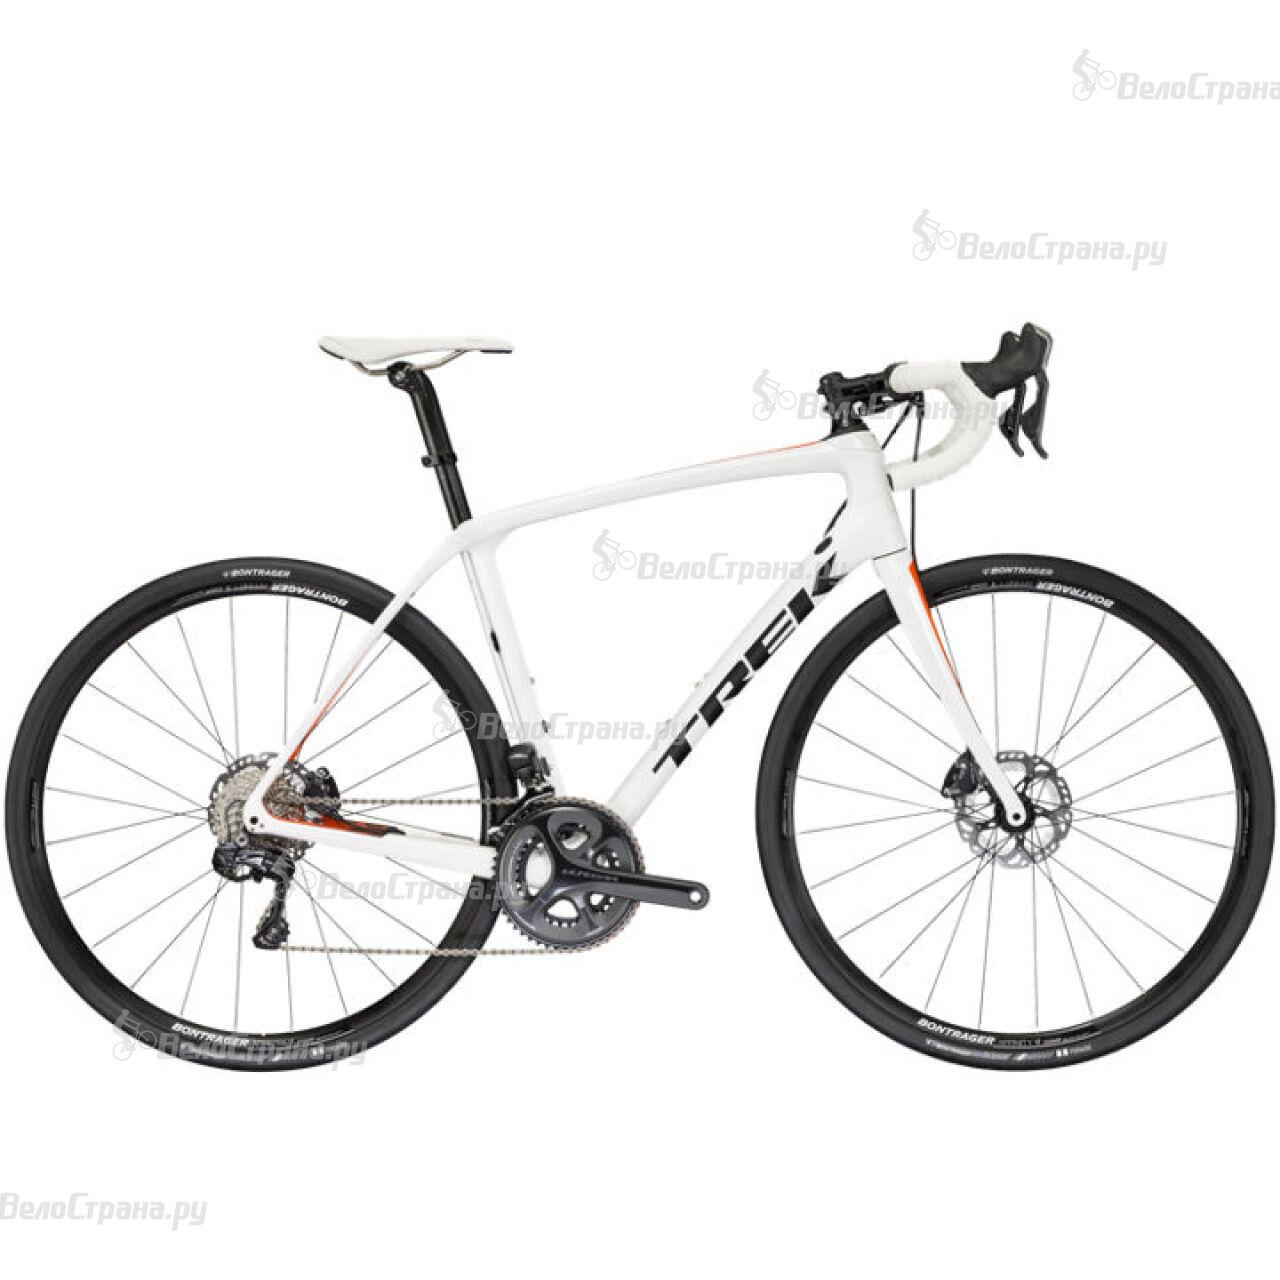 Велосипед Trek Domane SLR 7 Disc (2017) велосипед trek domane alr 4 disc 2017